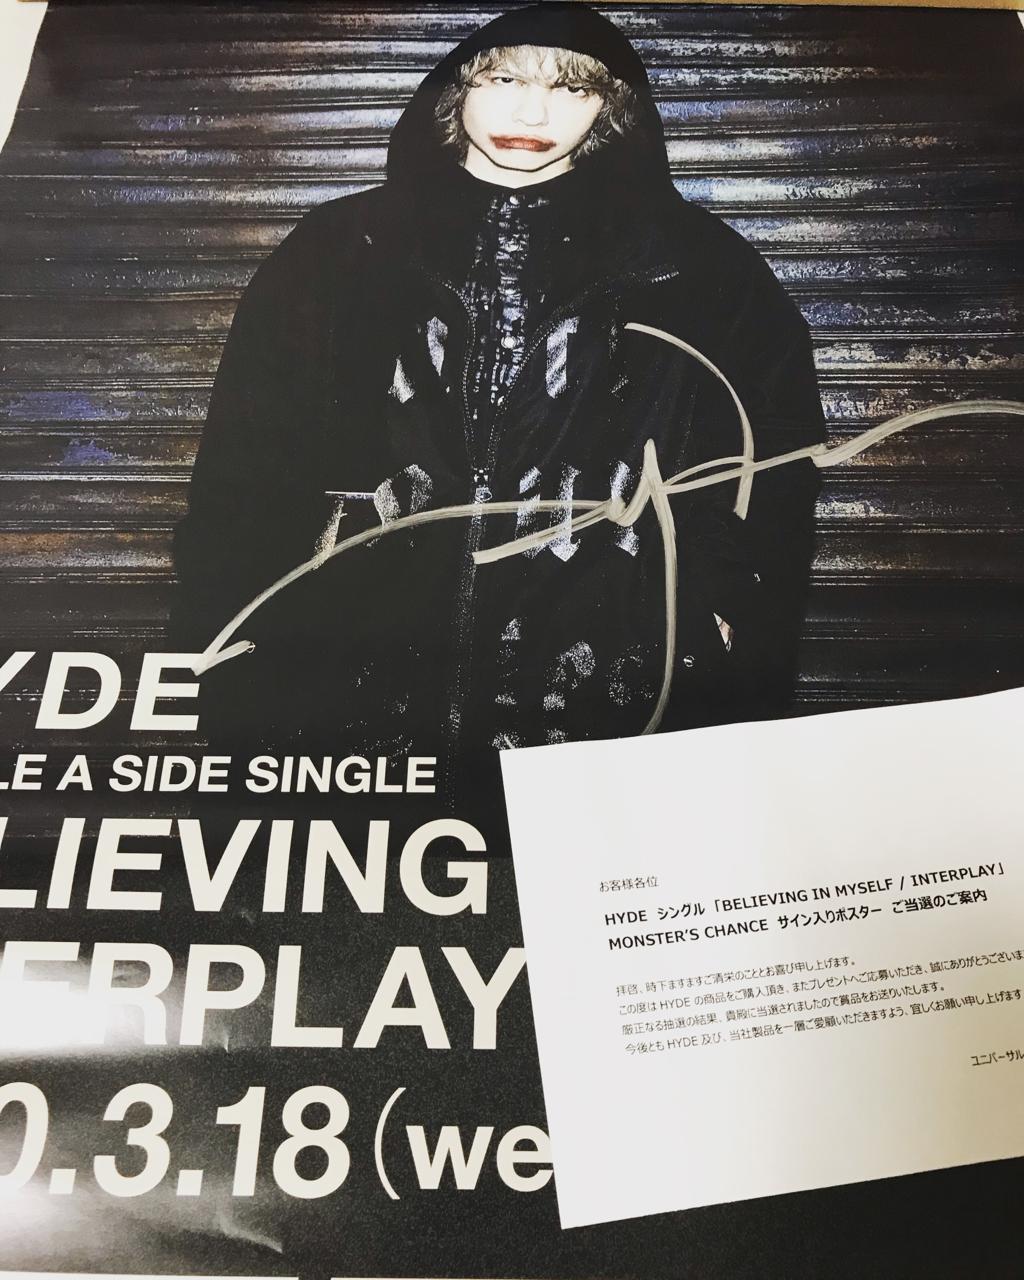 In hyde myself believing [HYDE]CDTVでHYDEが新曲「BELIEVING IN